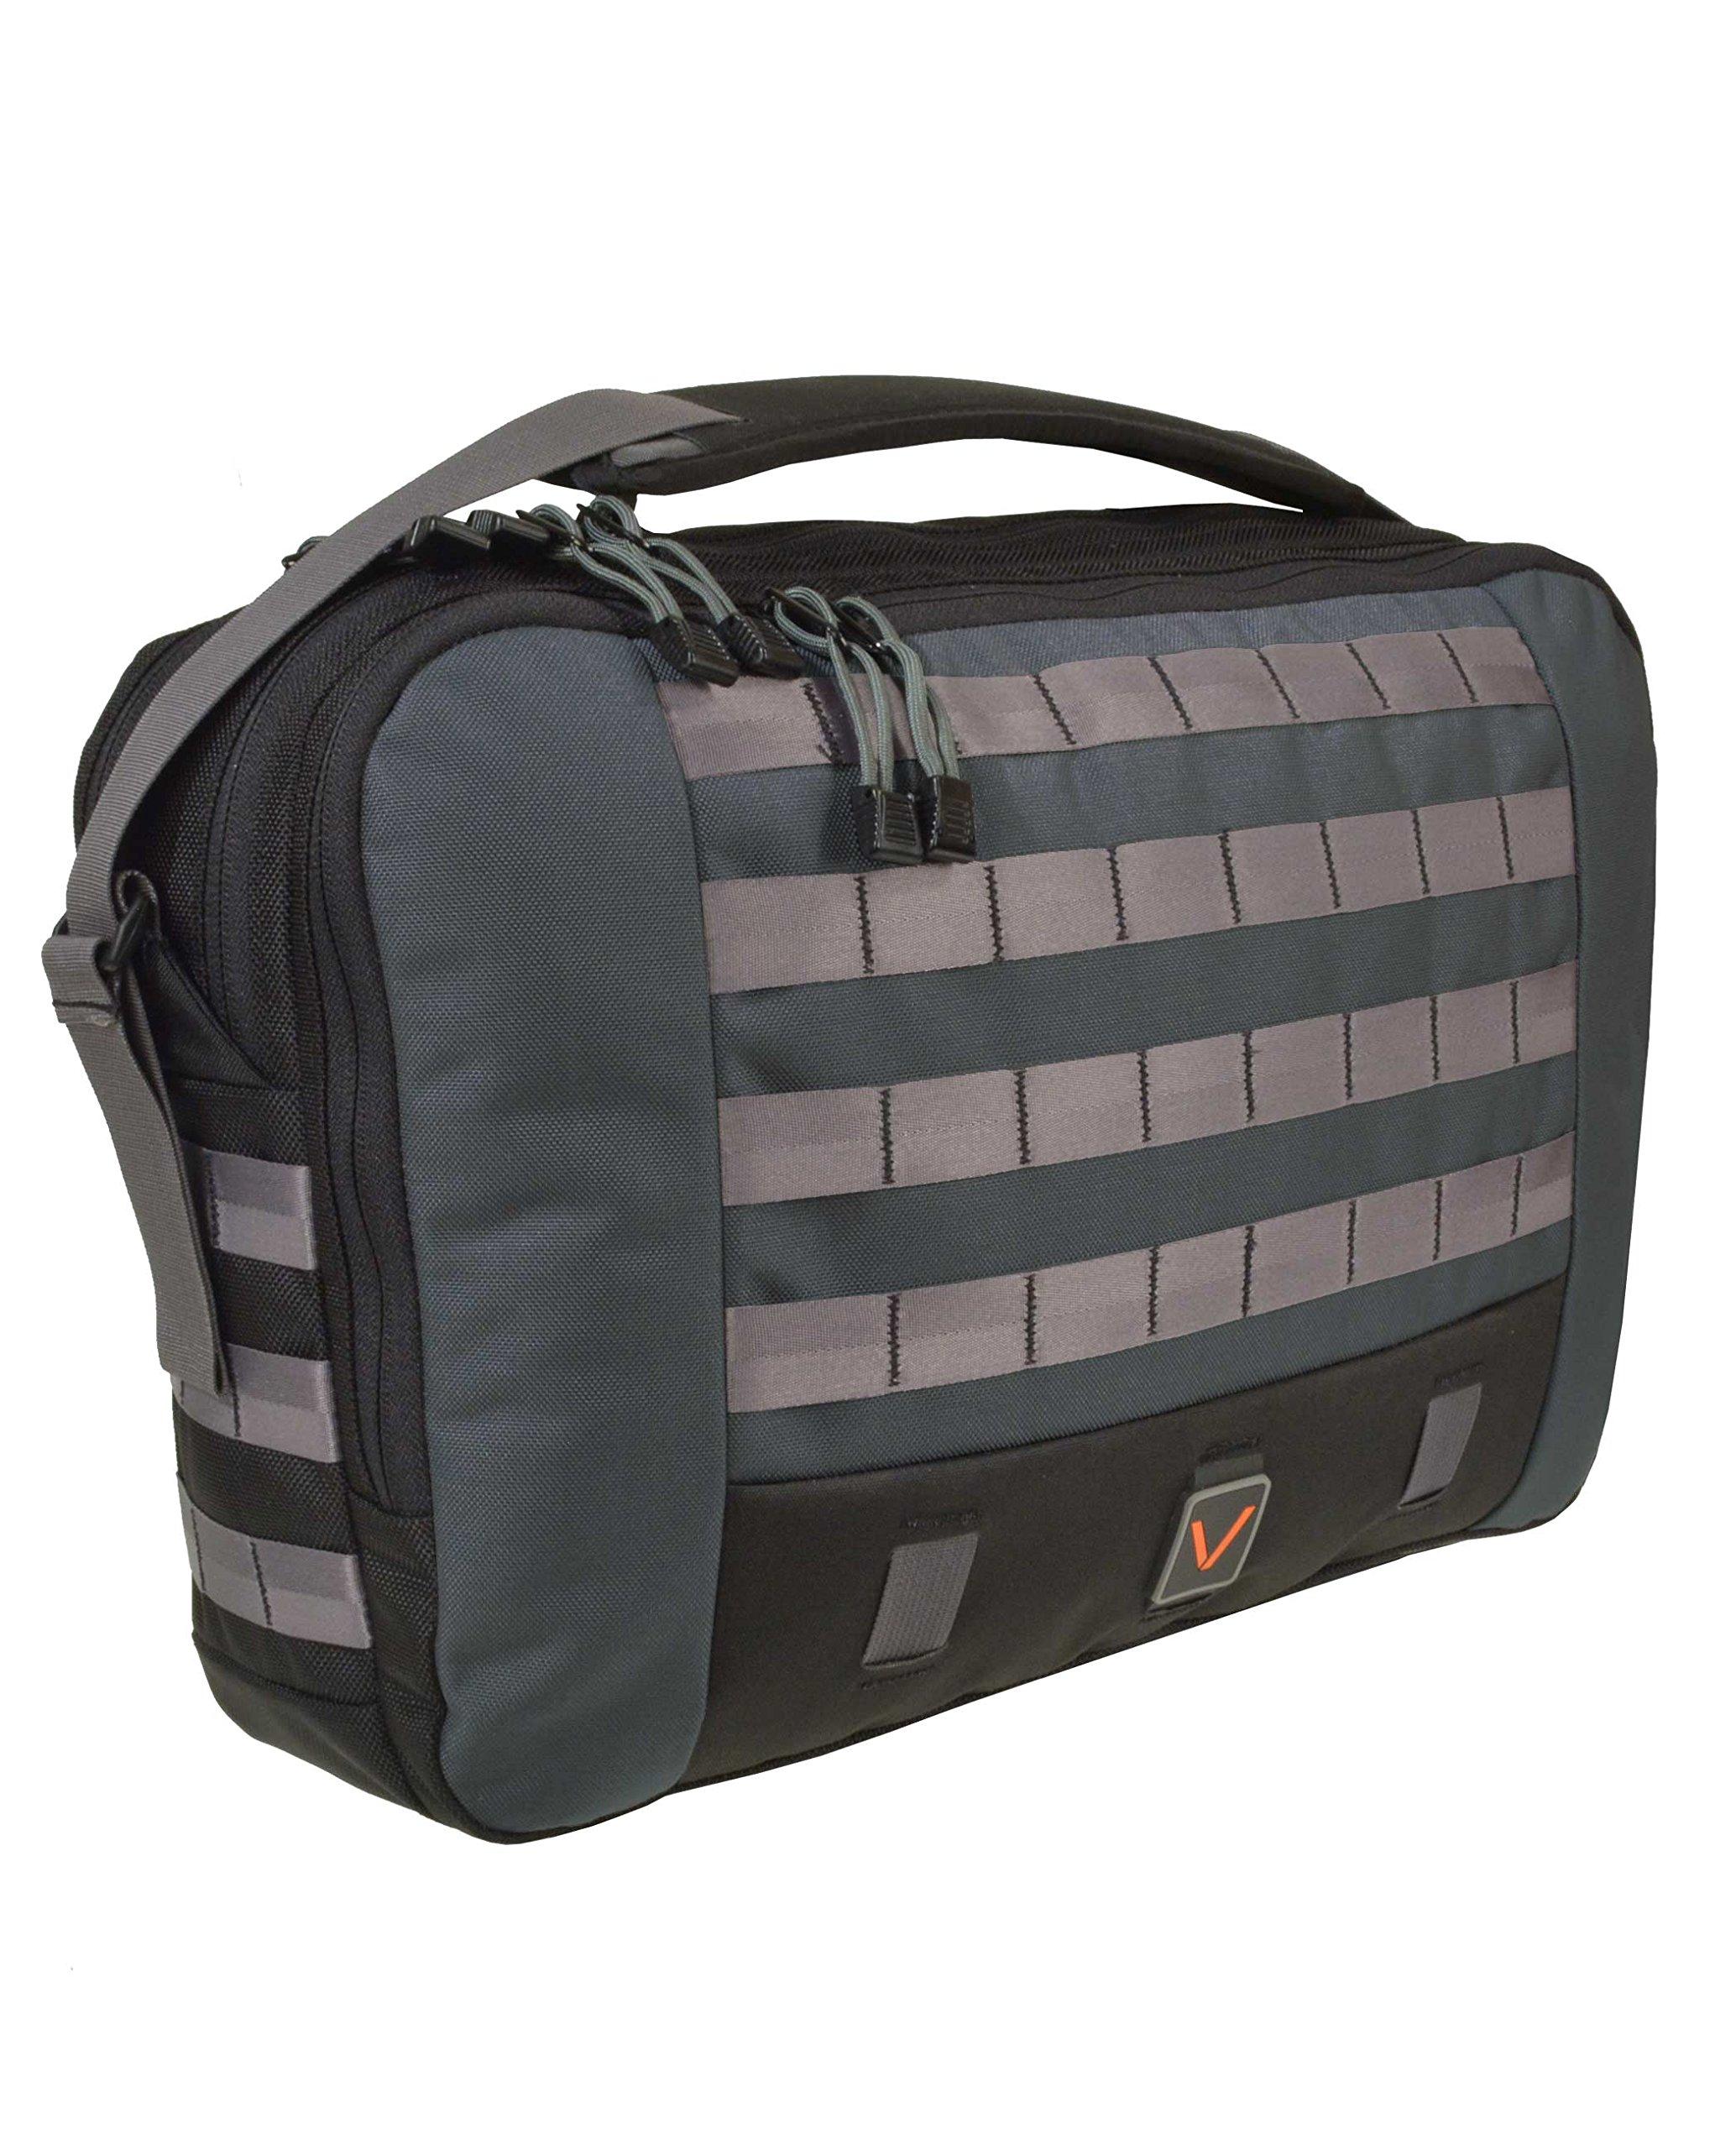 Velix Cases Blaze 25 Laptop Shoulderbag